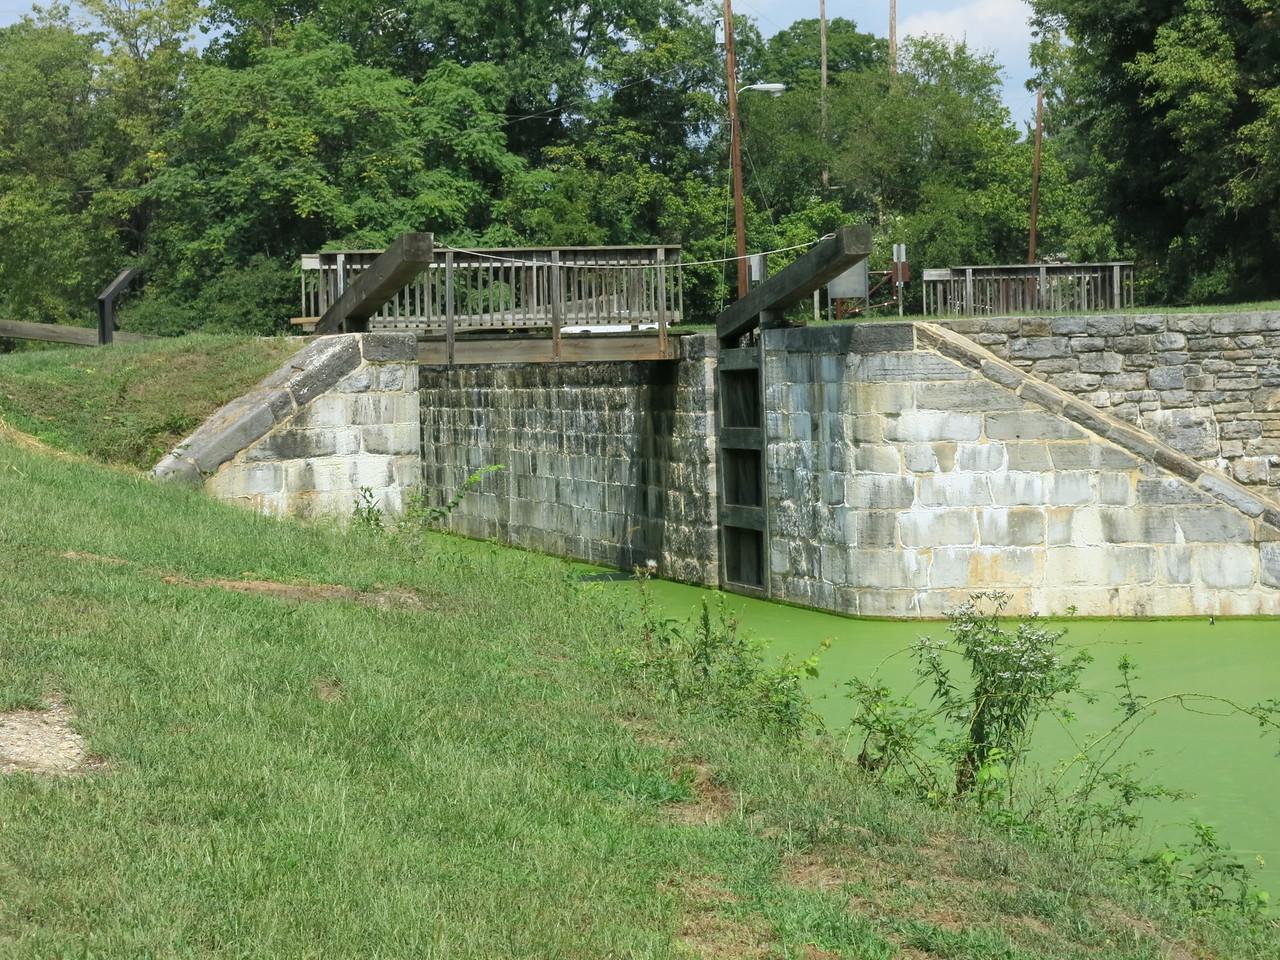 Downstream gate at Lock 44